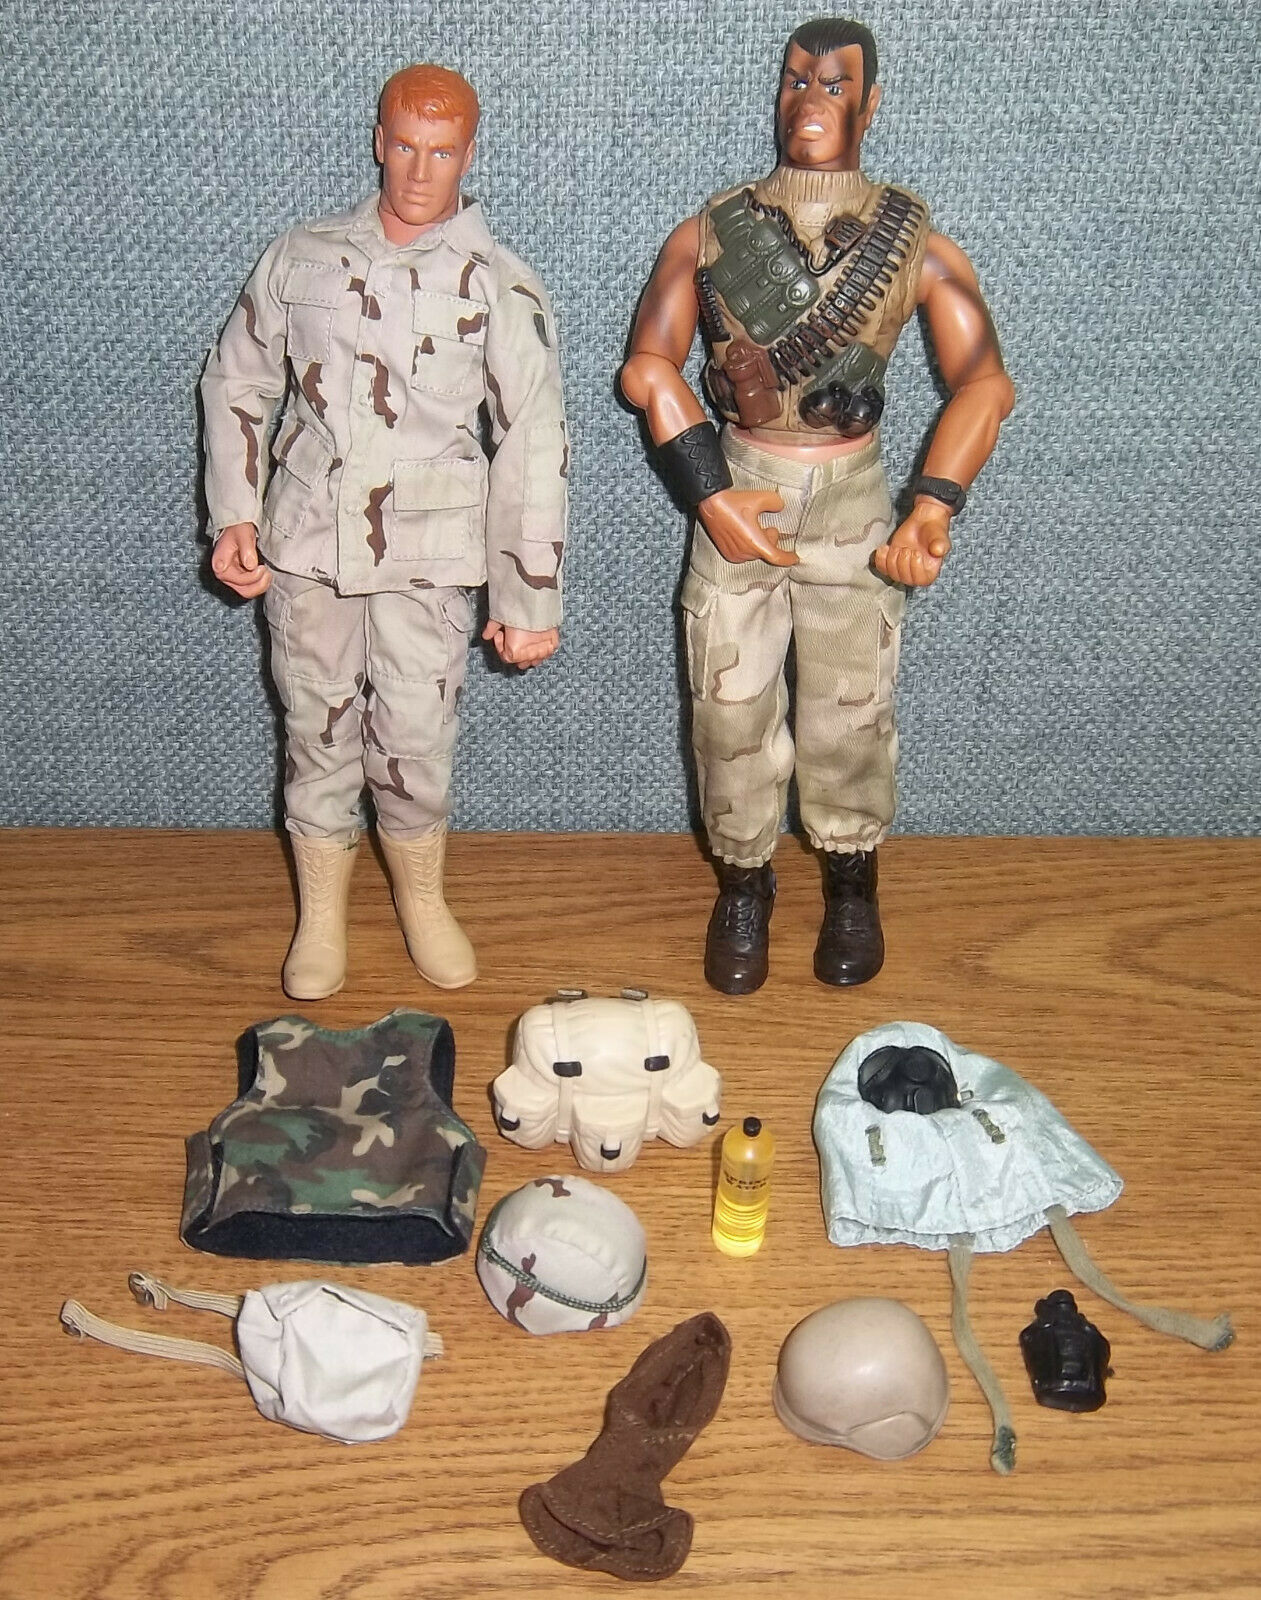 LOT Army Army Army Action Figures GI Joe Accessories Desert Vest Helmets GasMask Balaclava 6d73bb